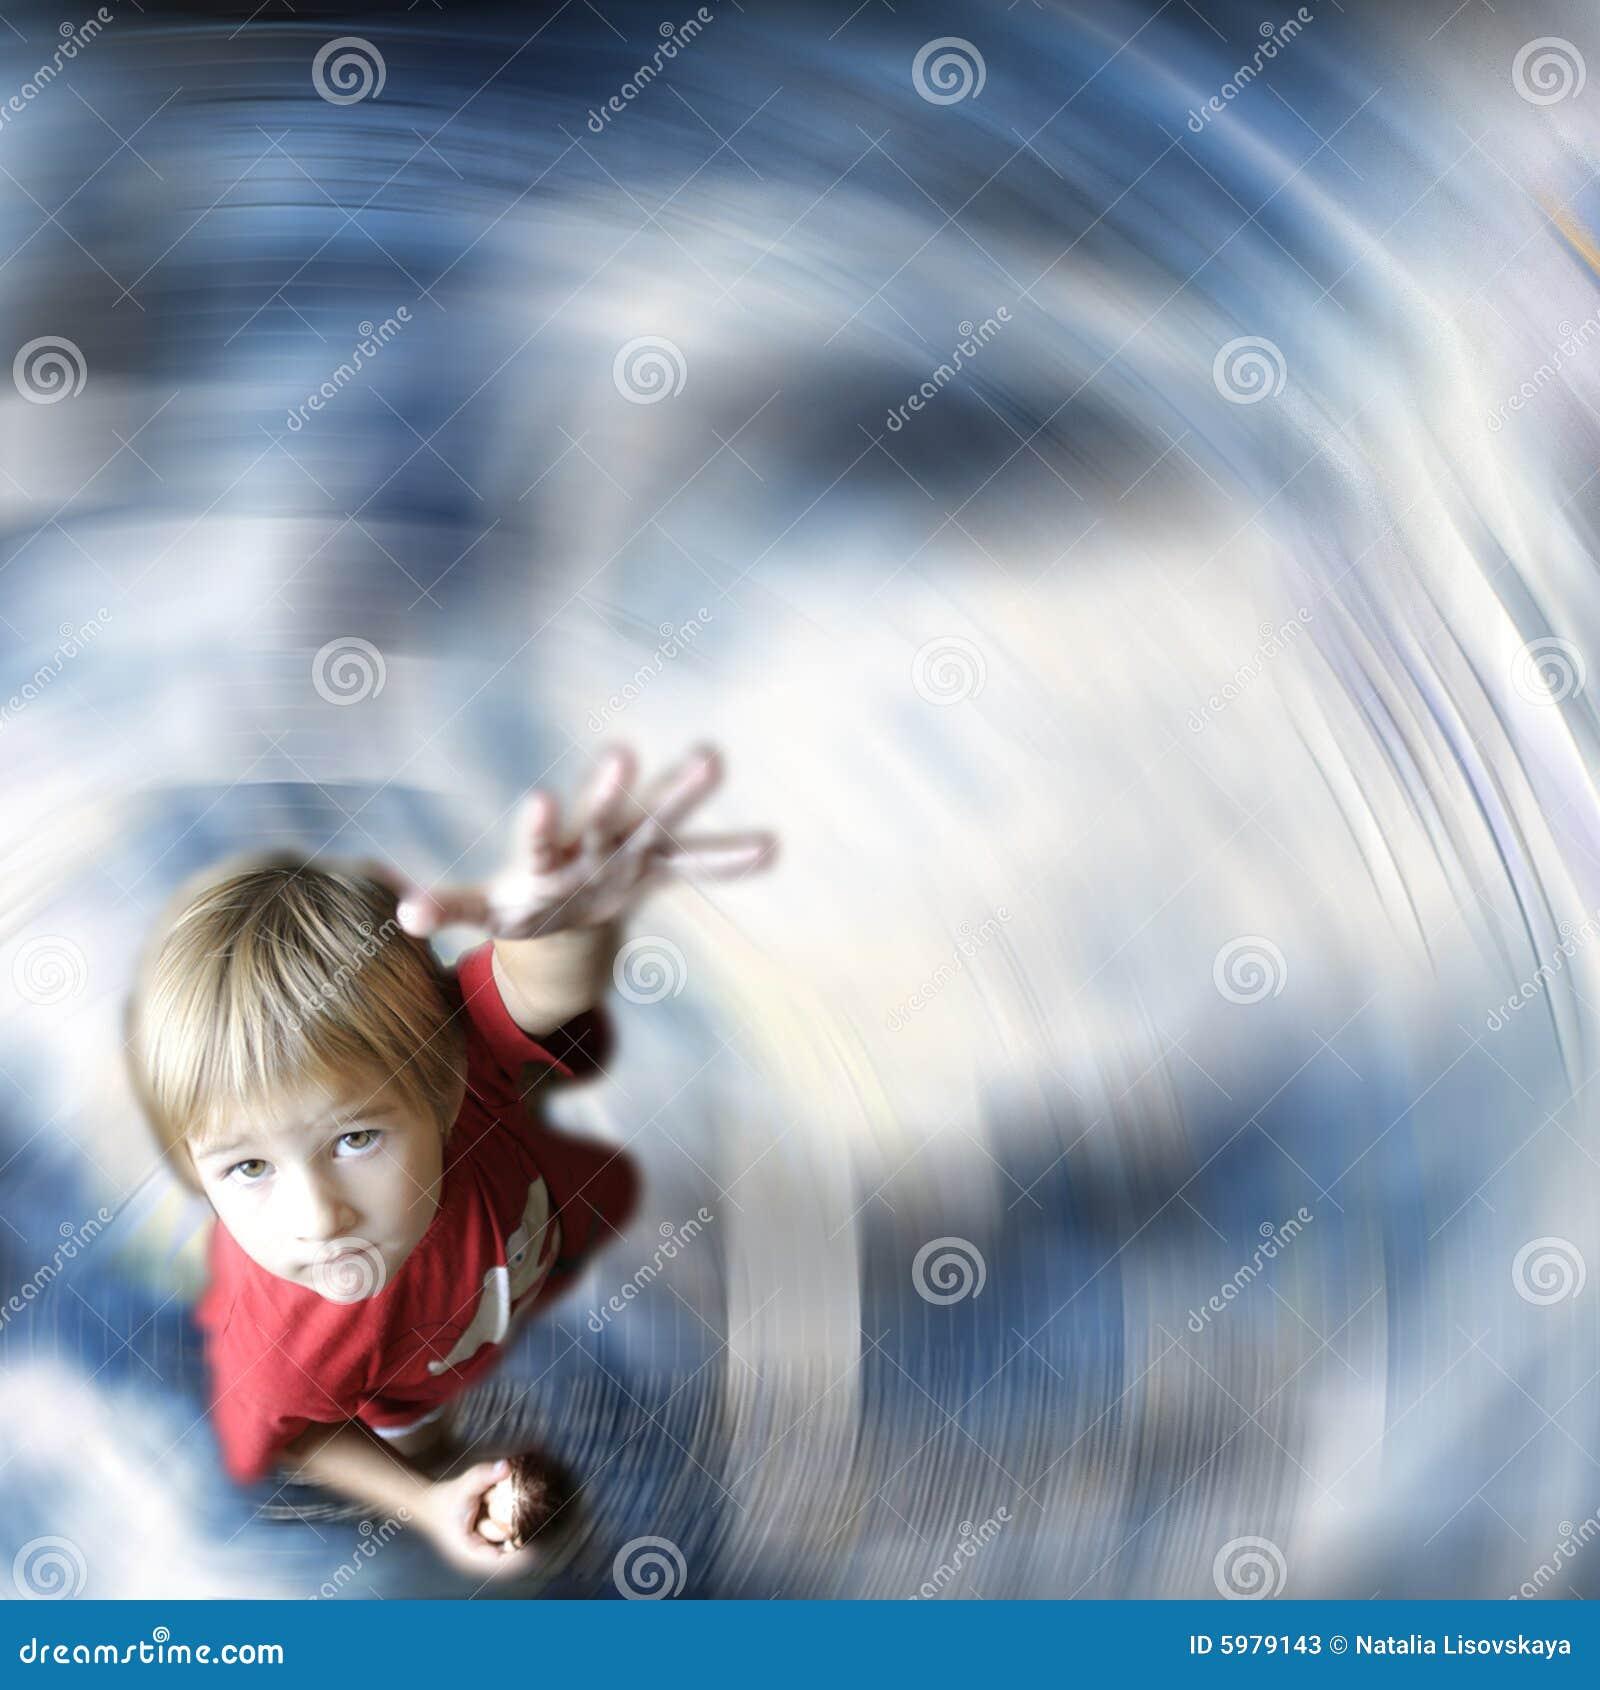 Kid offering hand